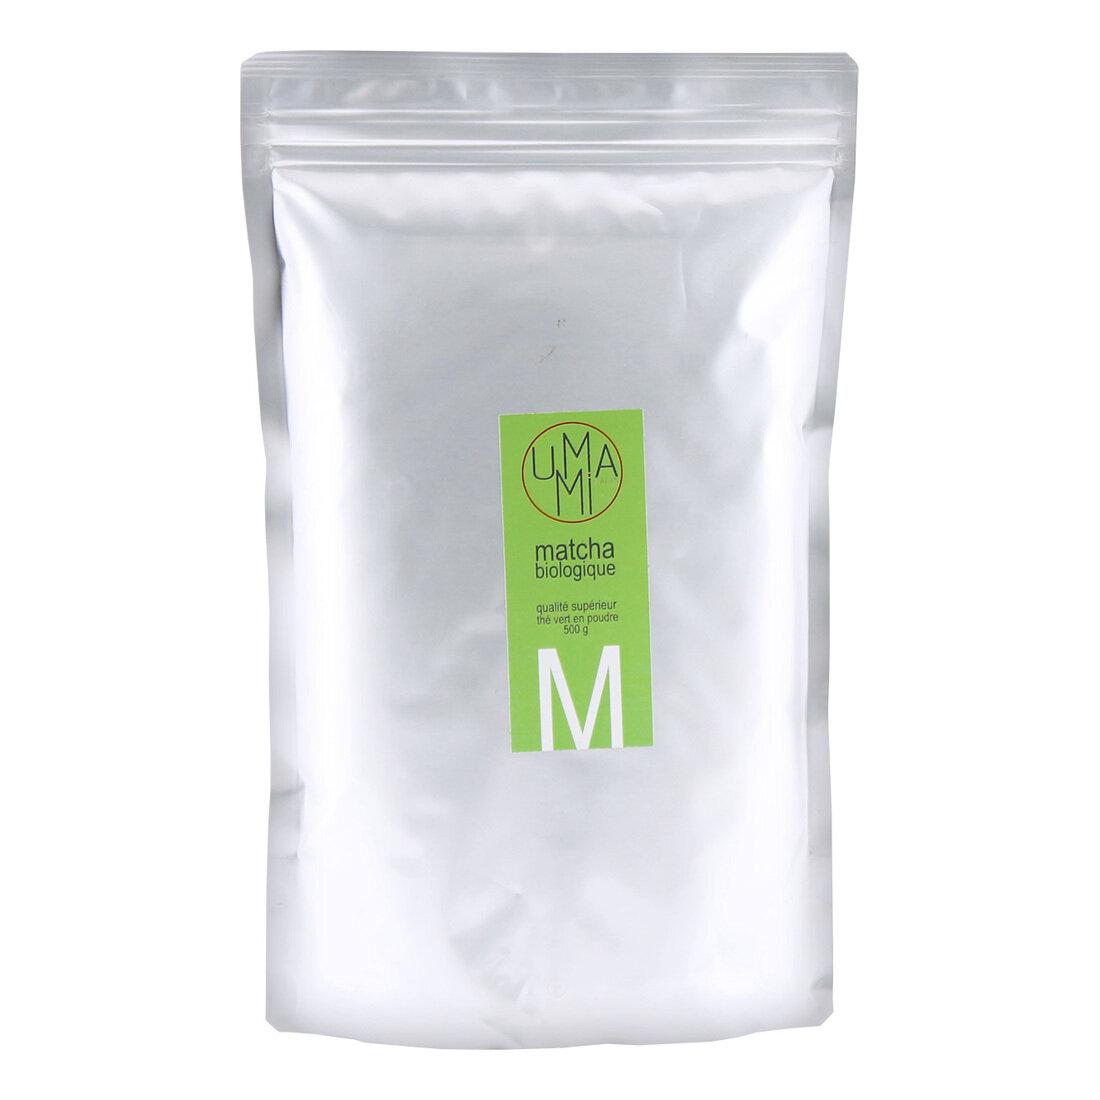 Luomu matcha tee | Organic Superior Matcha Tea | UMAMI | 500 G